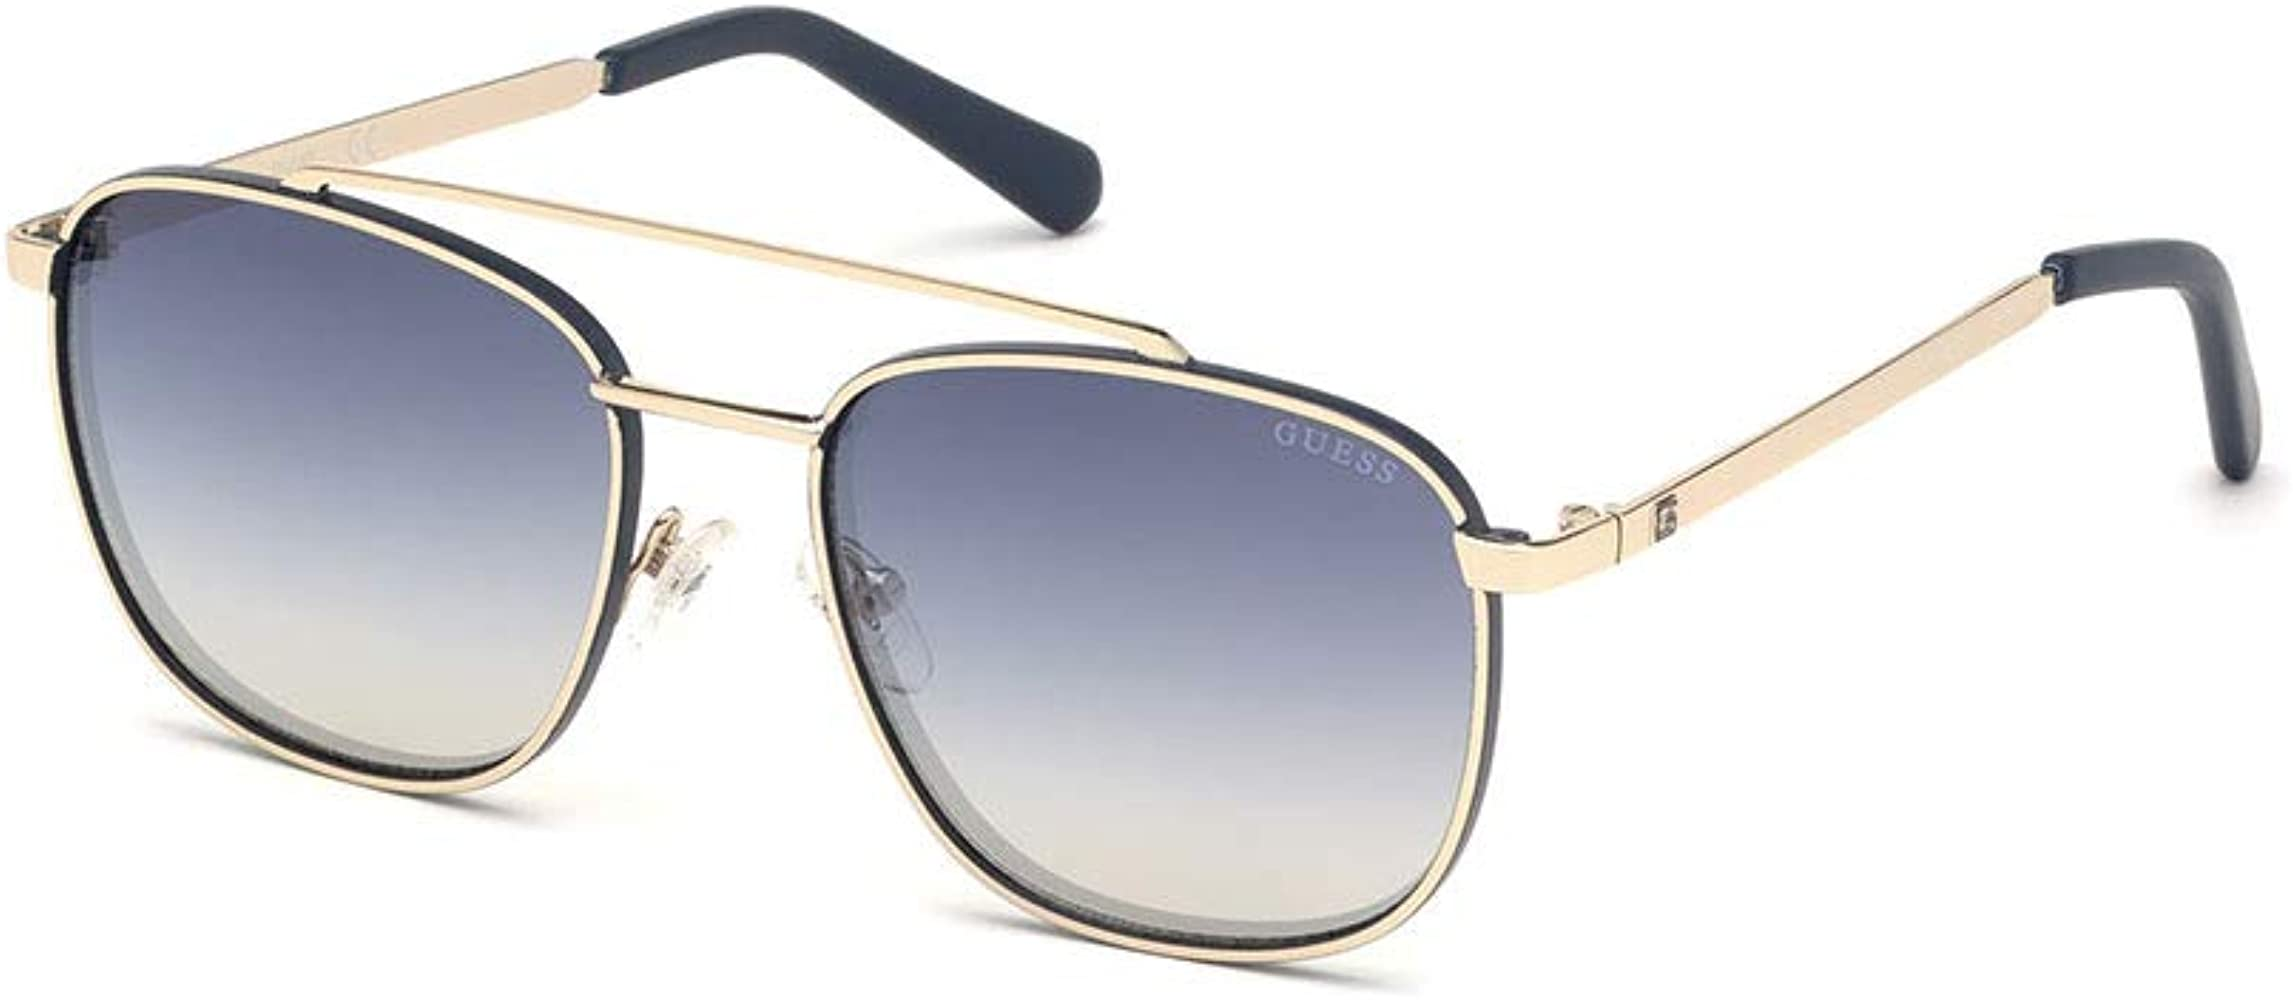 Guess gafas de sol para hombre GU6946 32X metal, dorado ...